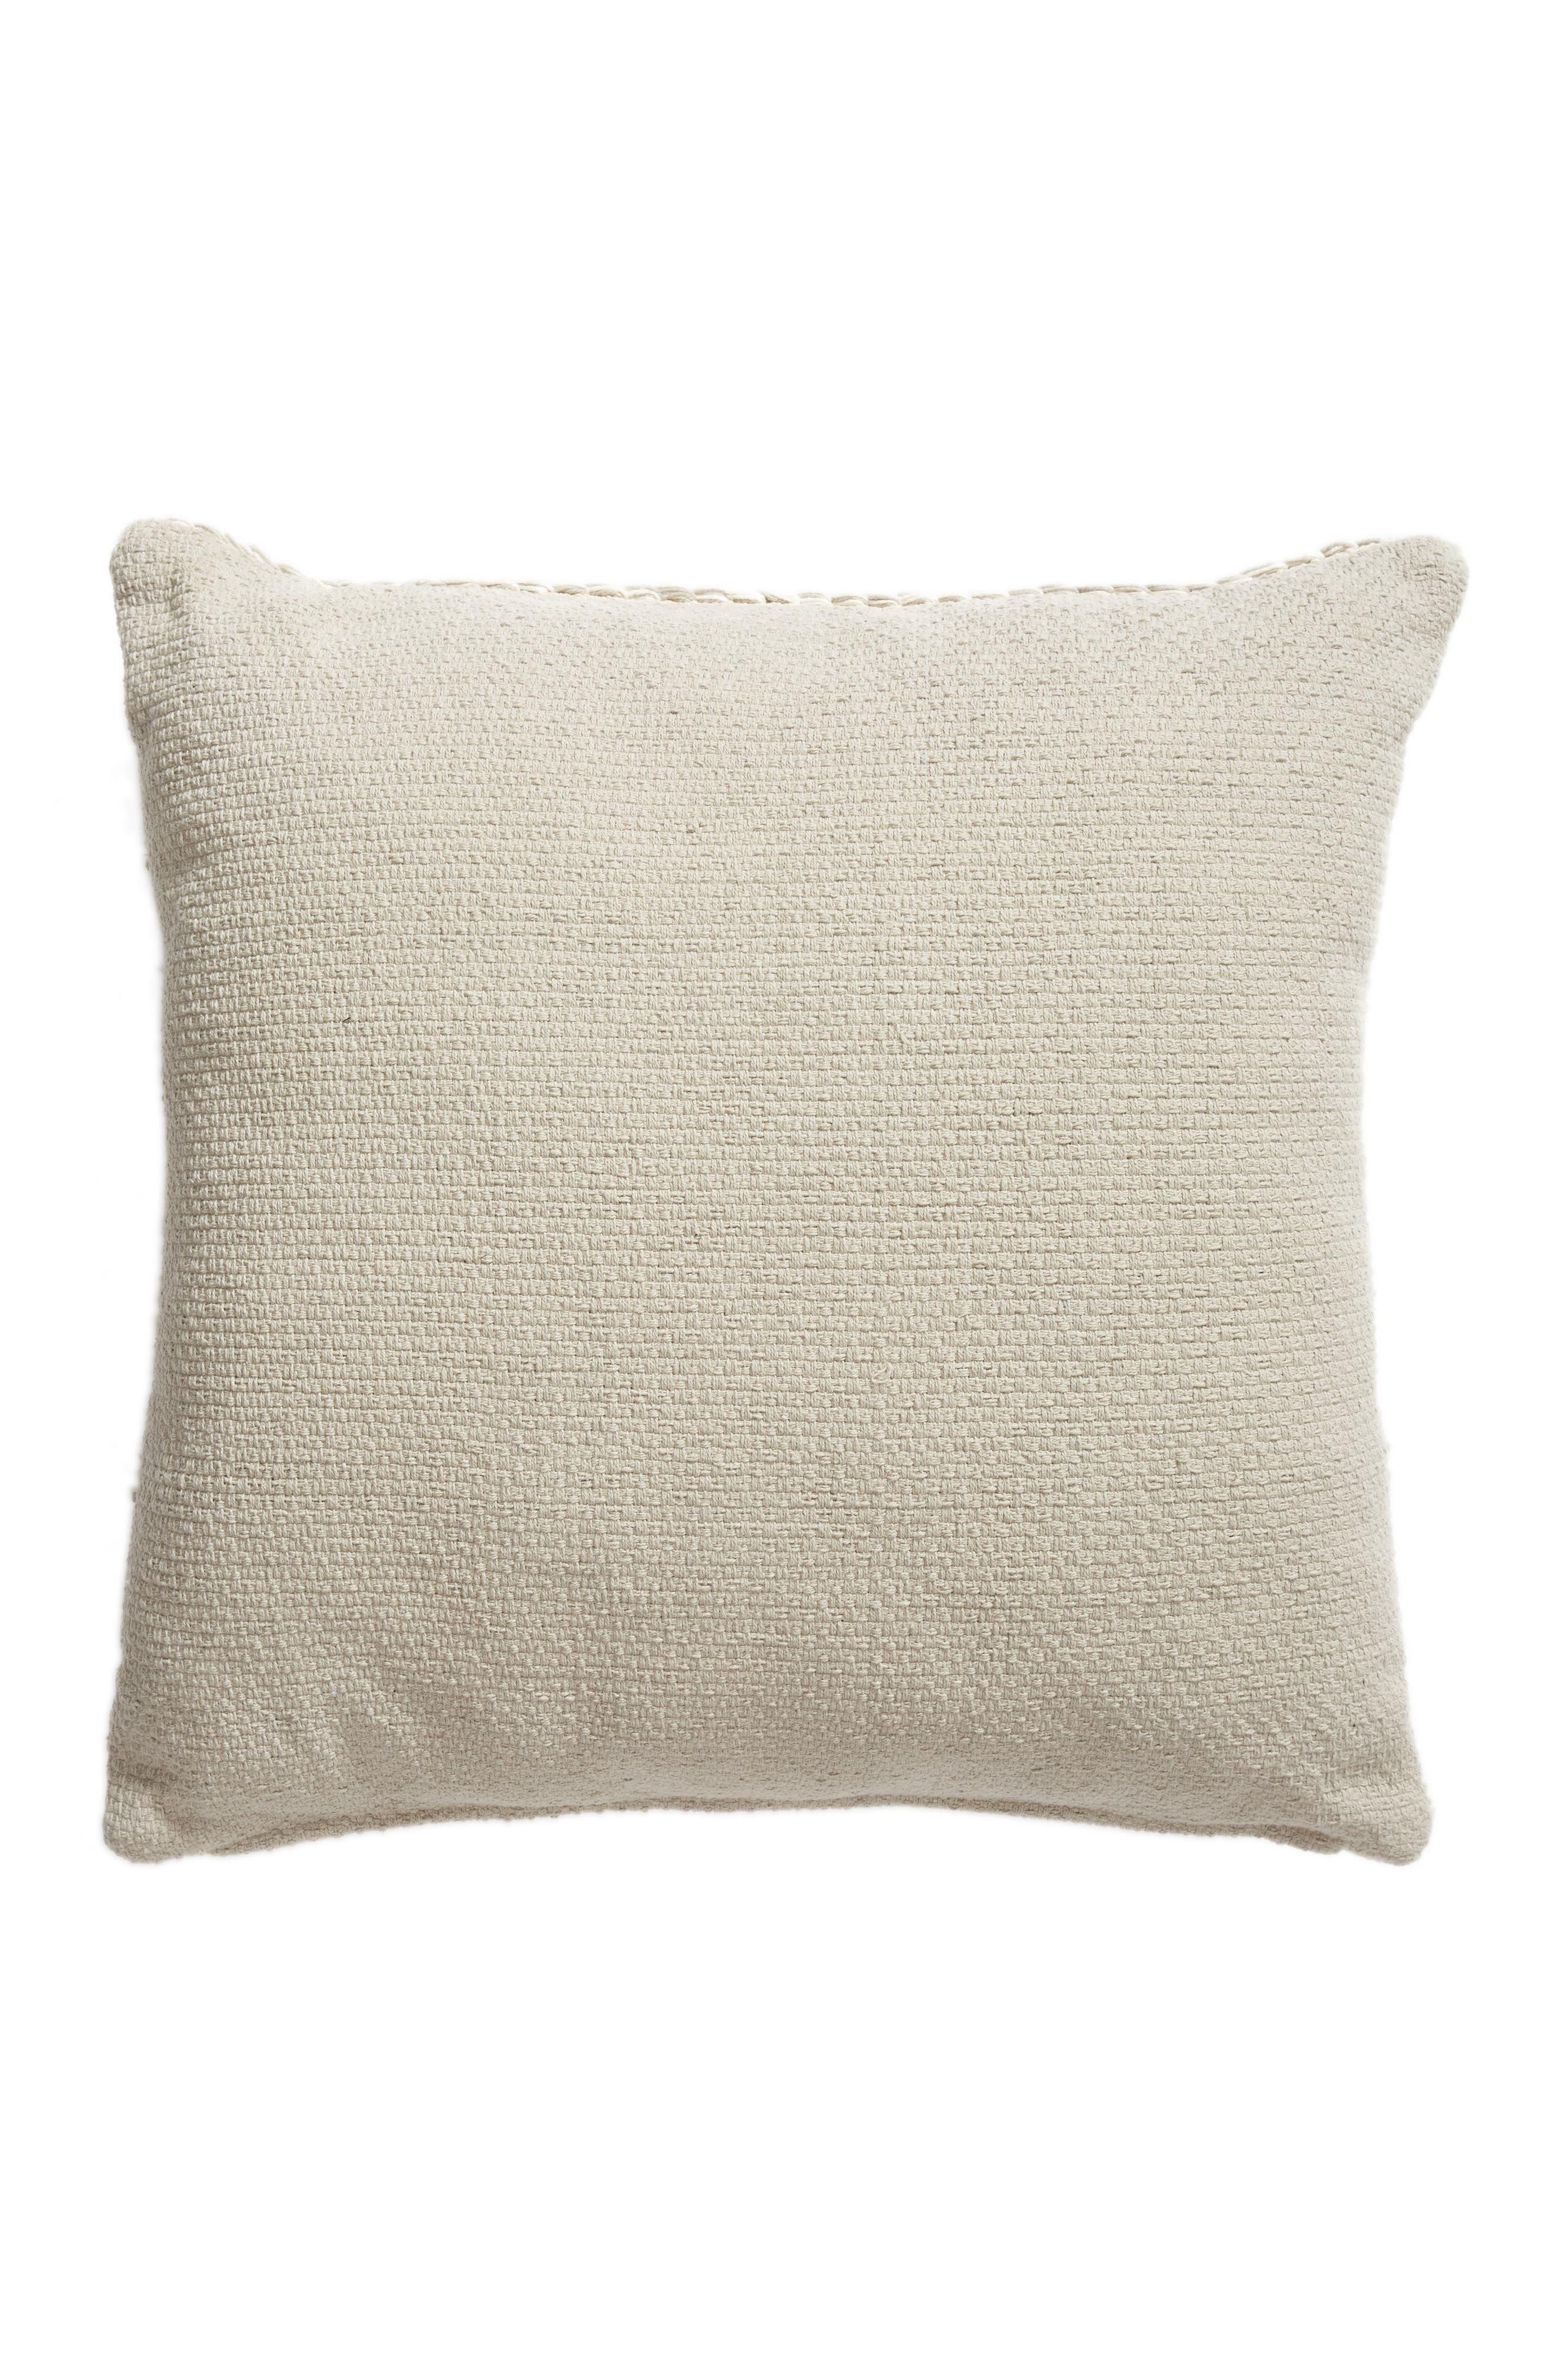 Knit Floor Pillow,                             Alternate thumbnail 2, color,                             Grey Owl